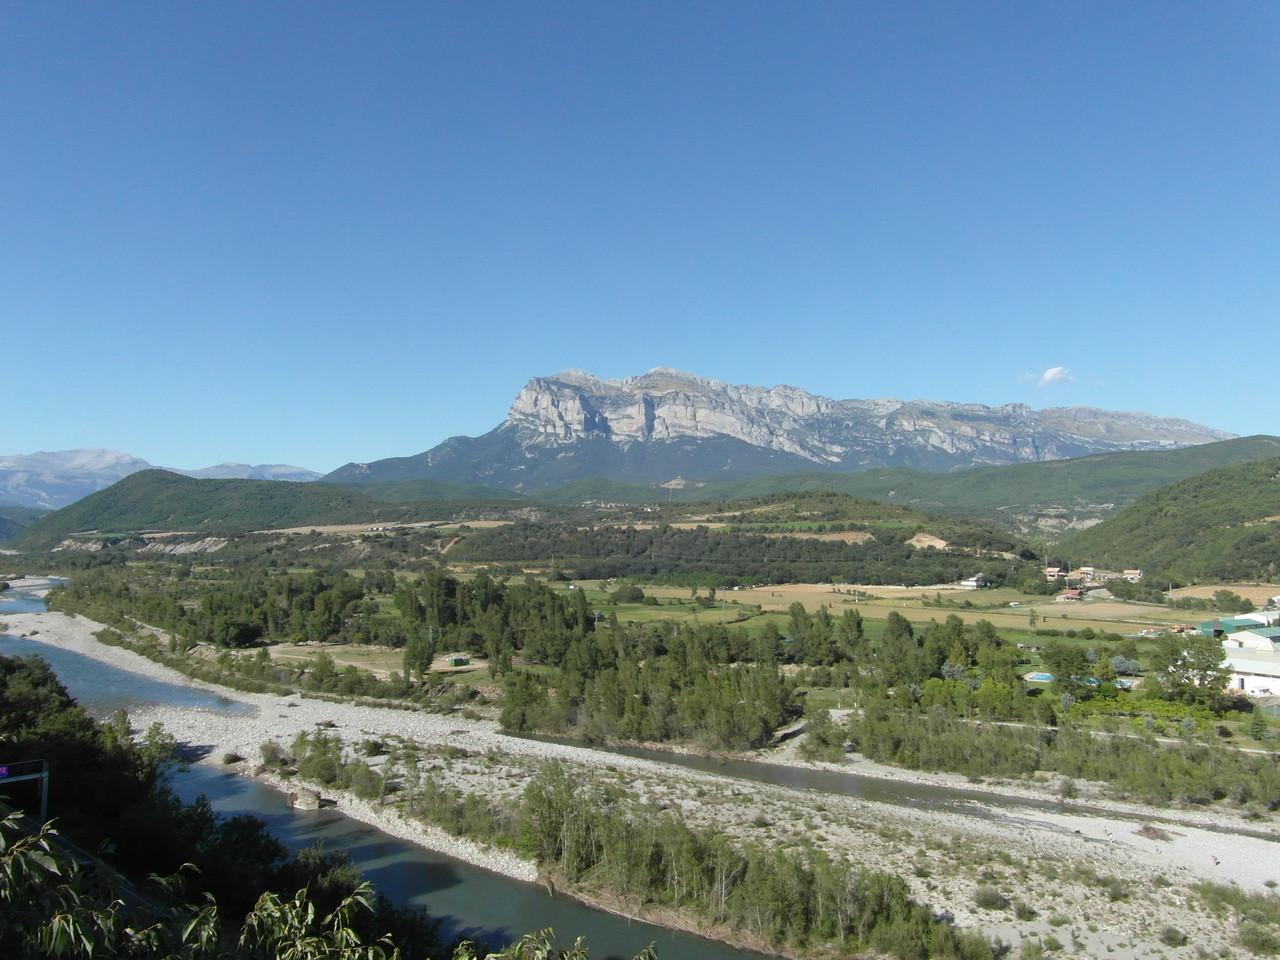 Vistas desde la torre de la Iglesia, al fondo Peña Montañesa.